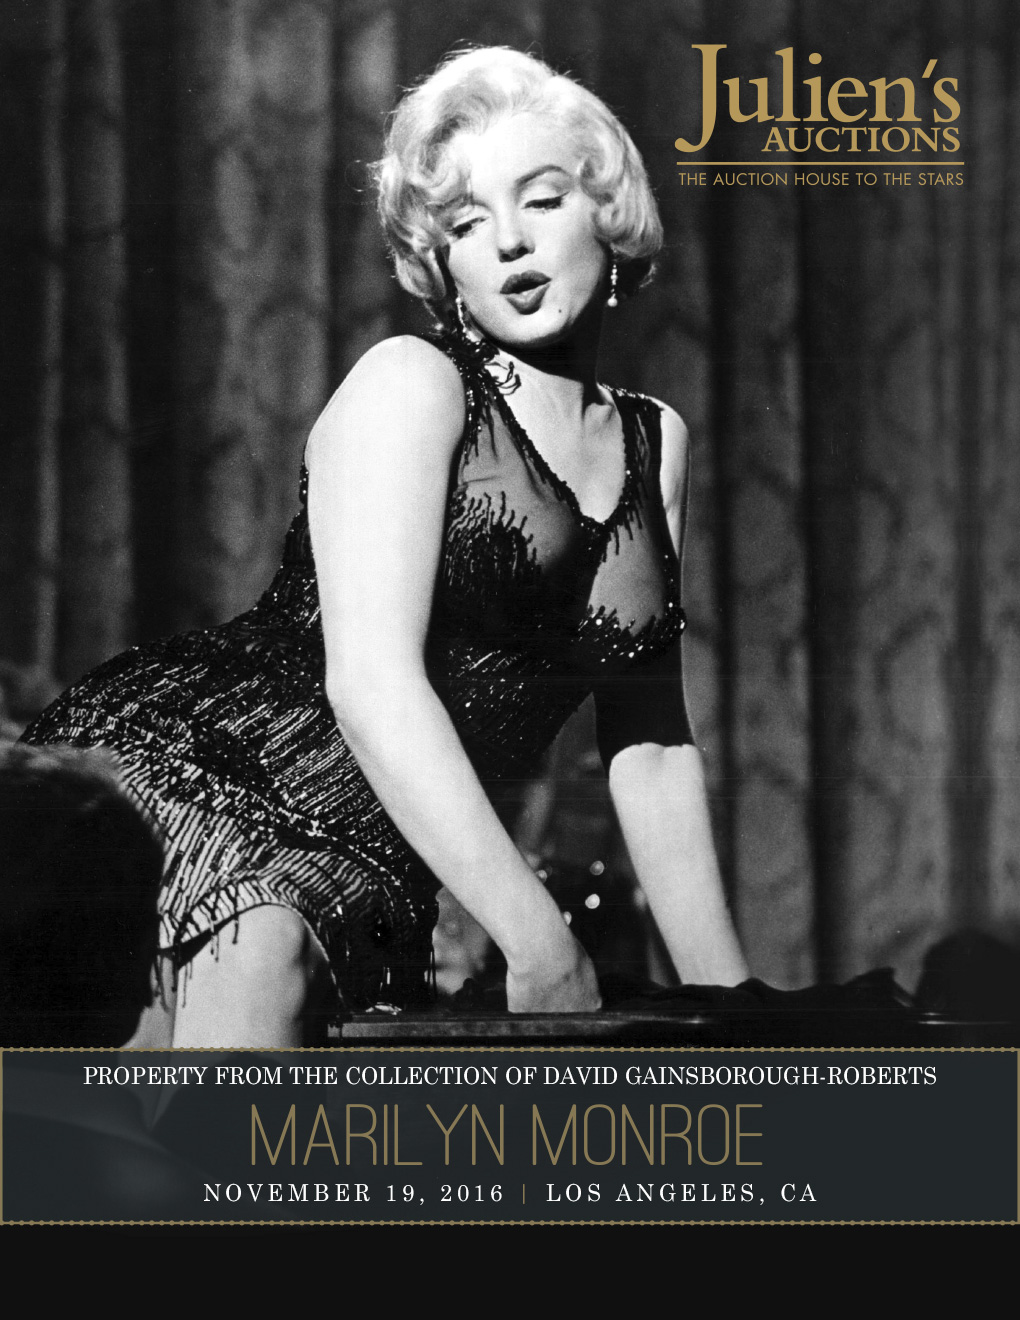 Julien's Auctions Marilyn Monroe's memorabilia